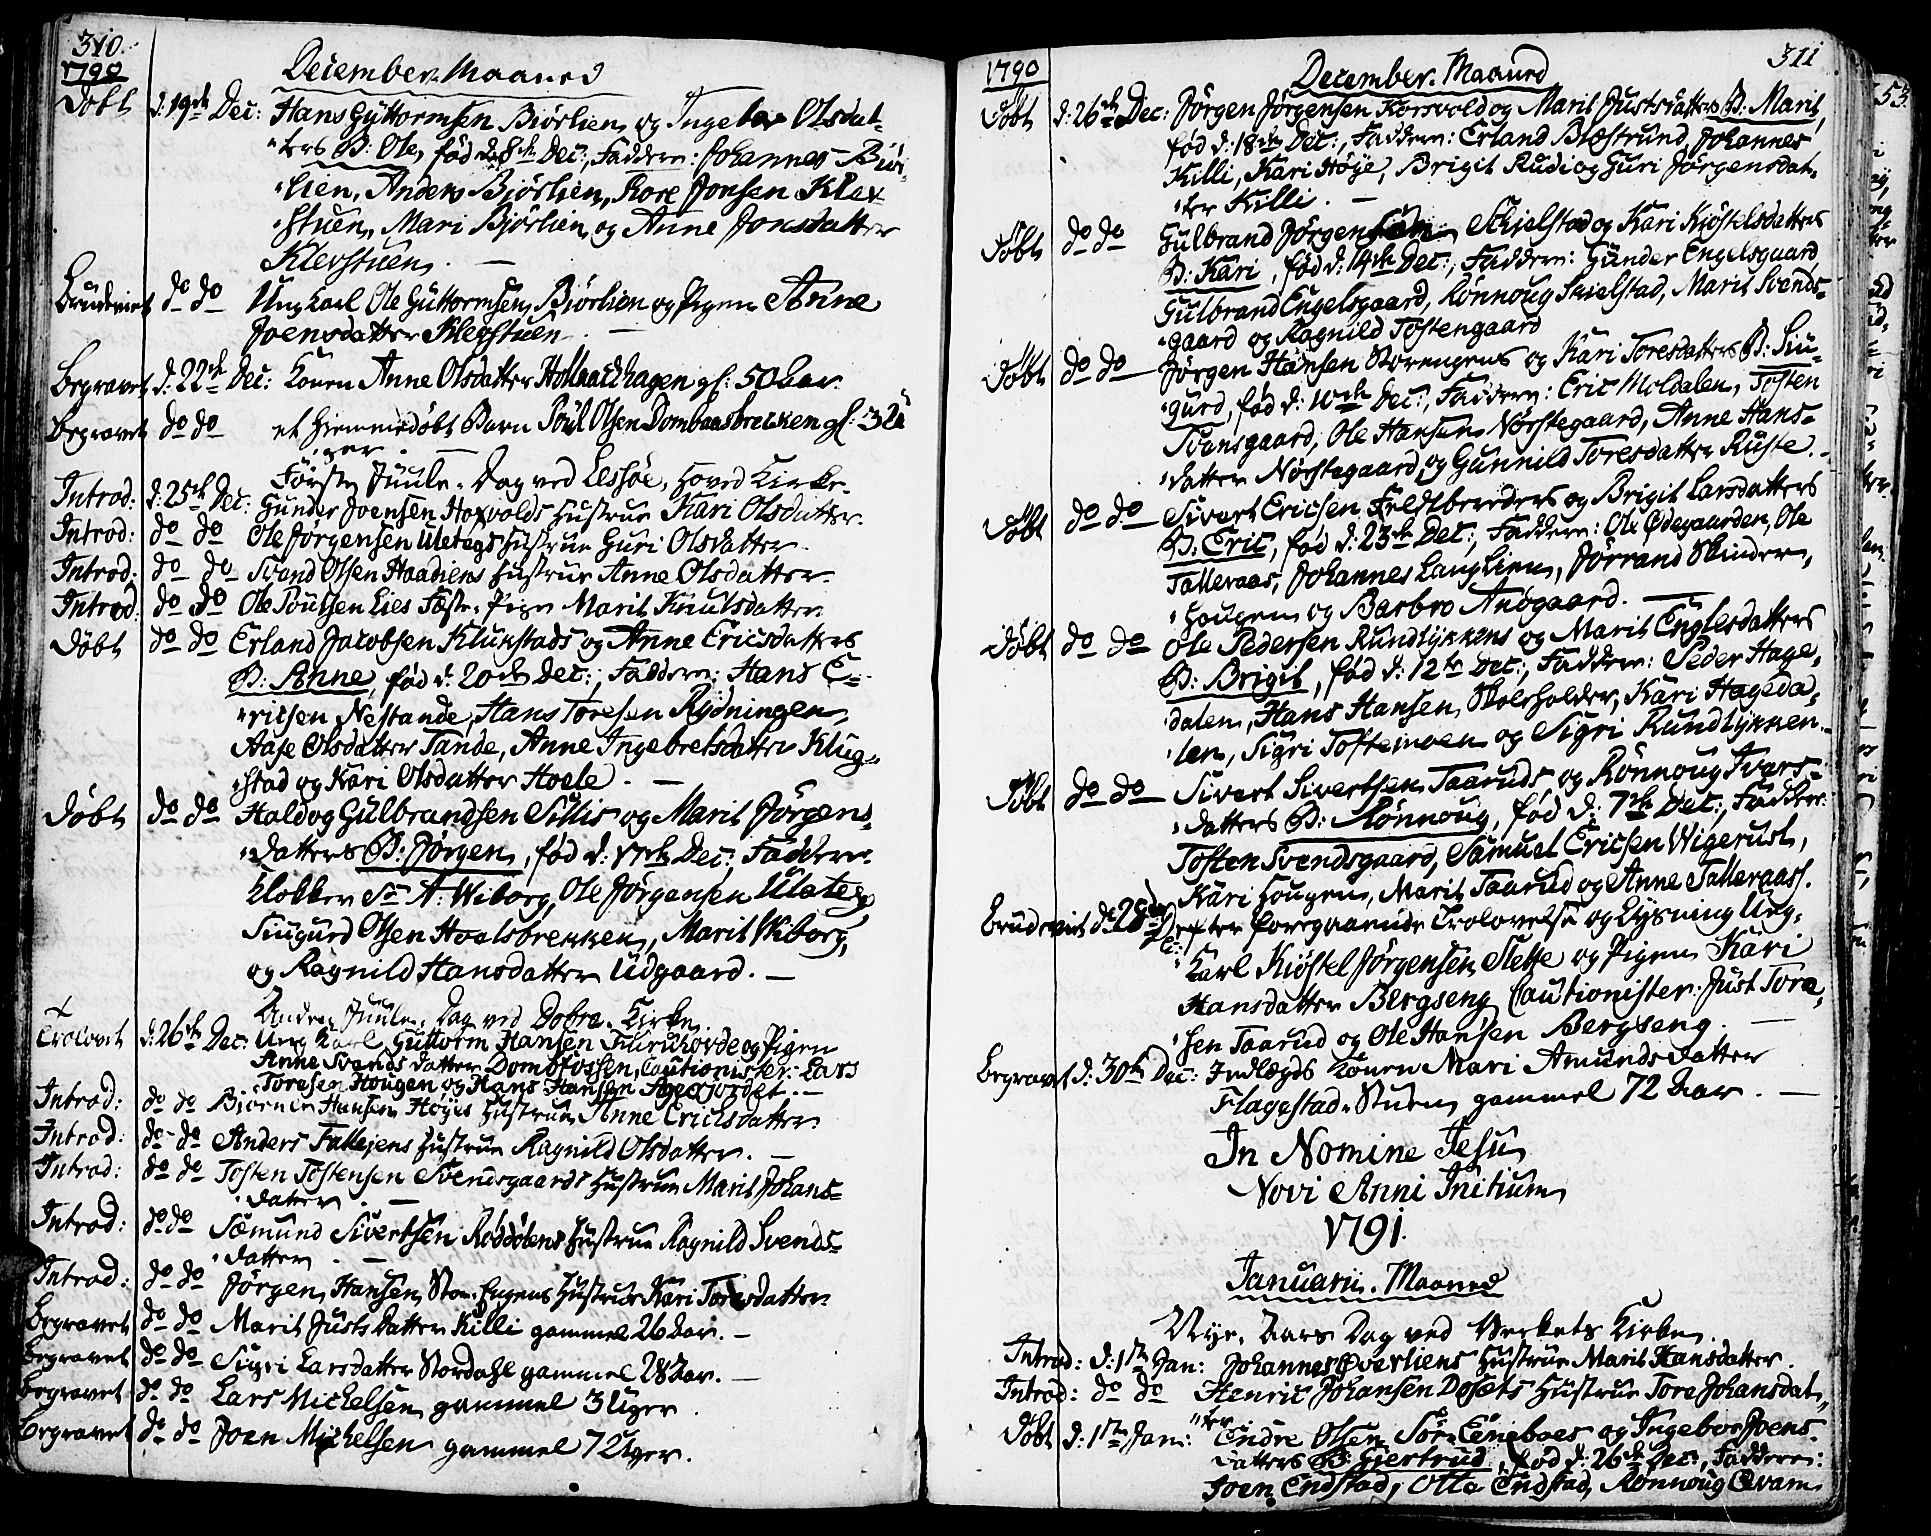 SAH, Lesja prestekontor, Ministerialbok nr. 3, 1777-1819, s. 310-311